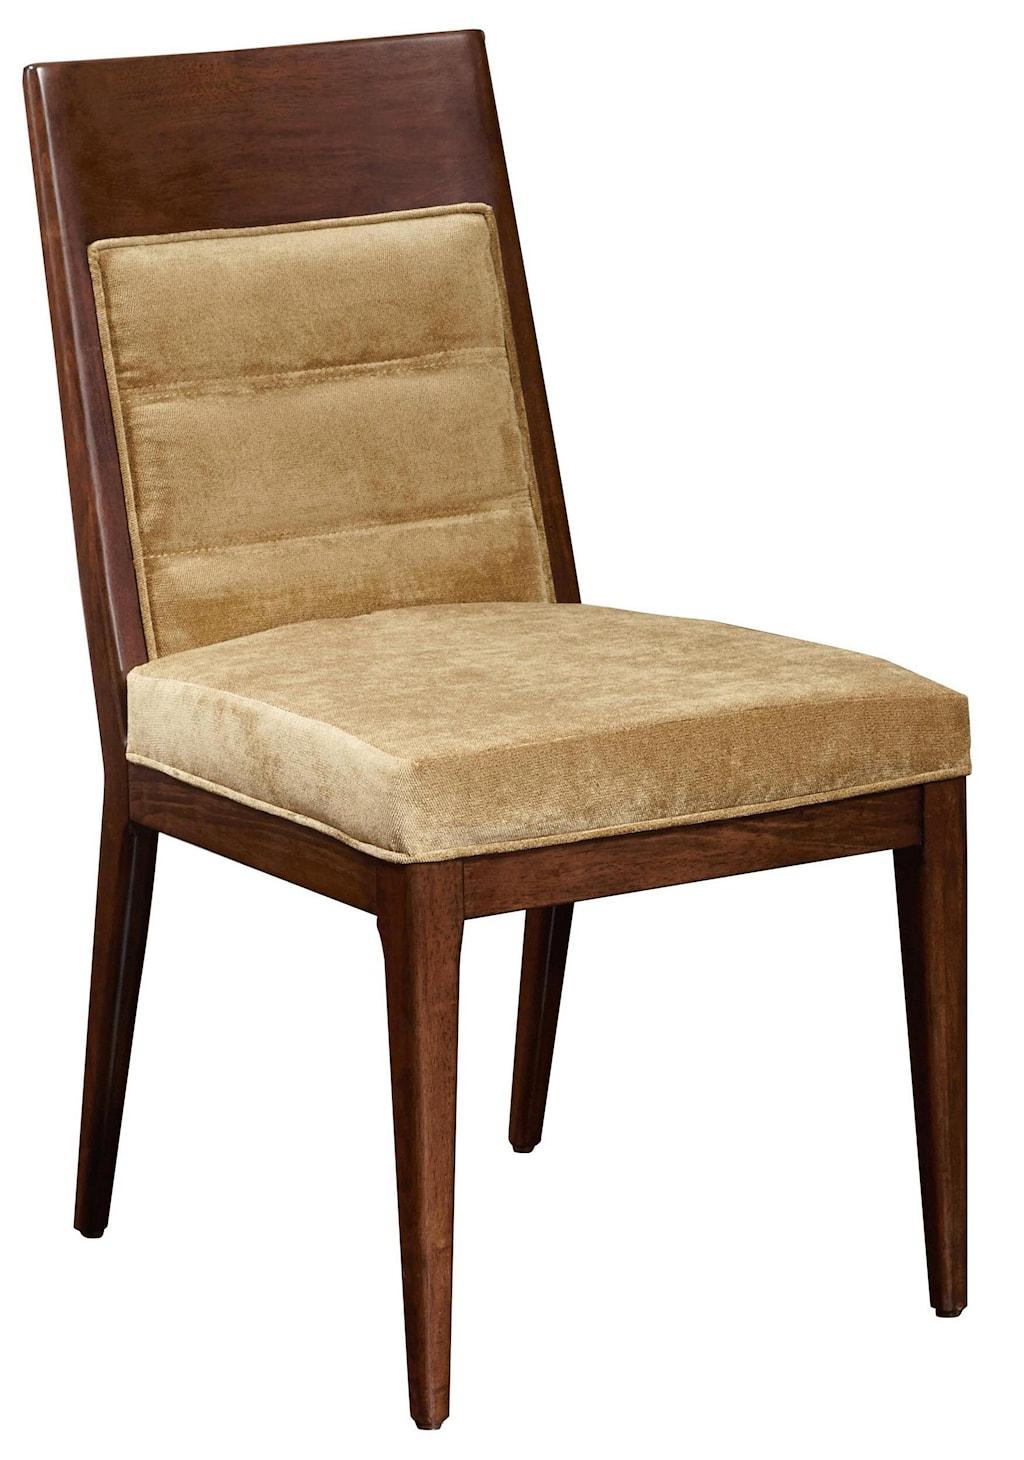 pulaski furniture modern harmony 7 pc dining table set w modern harmony 7 pc dining table set w uphostered chairs by pulaski furniture